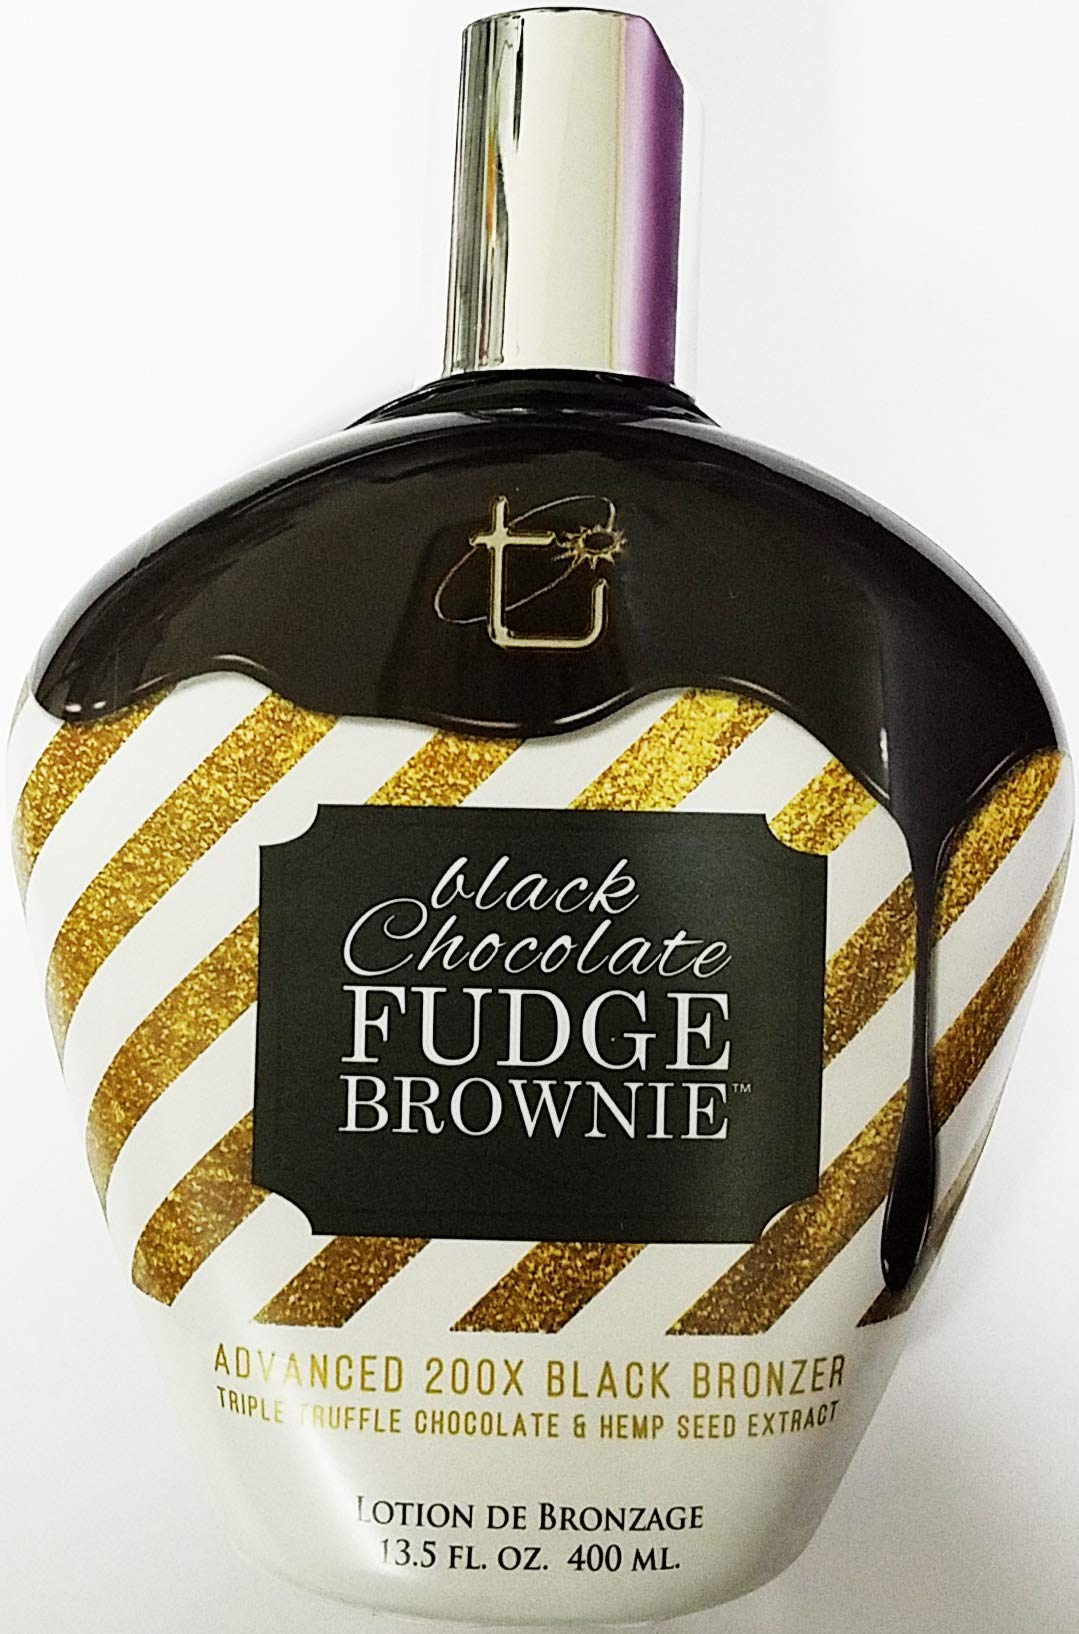 Brown Sugar BLACK CHOCOLATE FUDGE BROWNIE 200X Black Bronzer - 13.5 oz